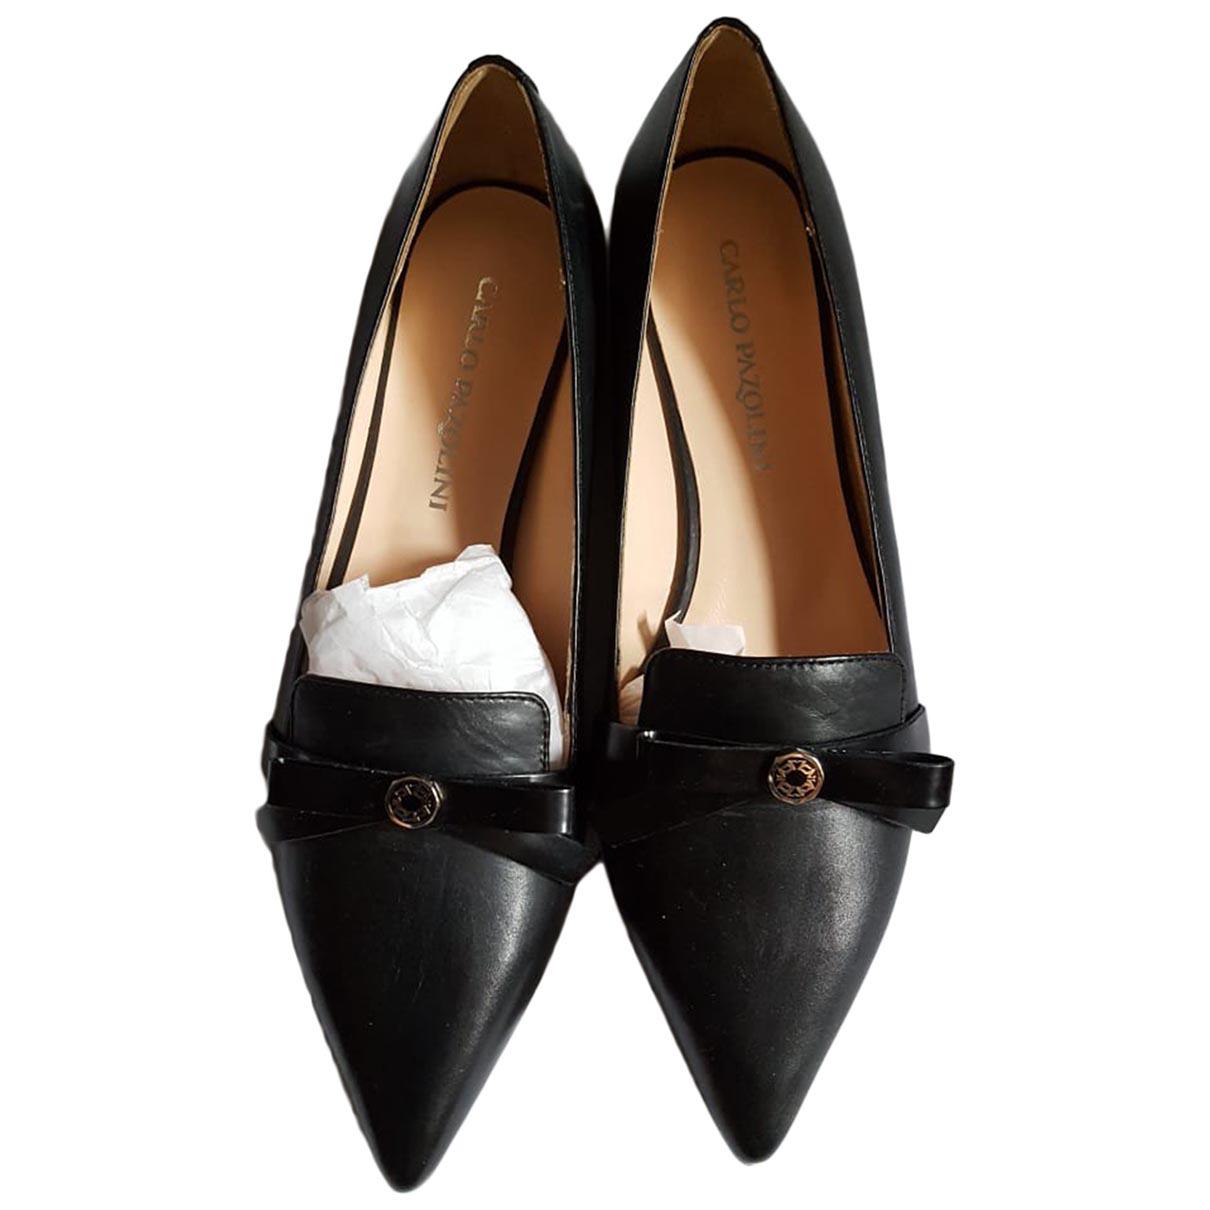 Carlo Pazolini \N Black Leather Ballet flats for Women 36 EU